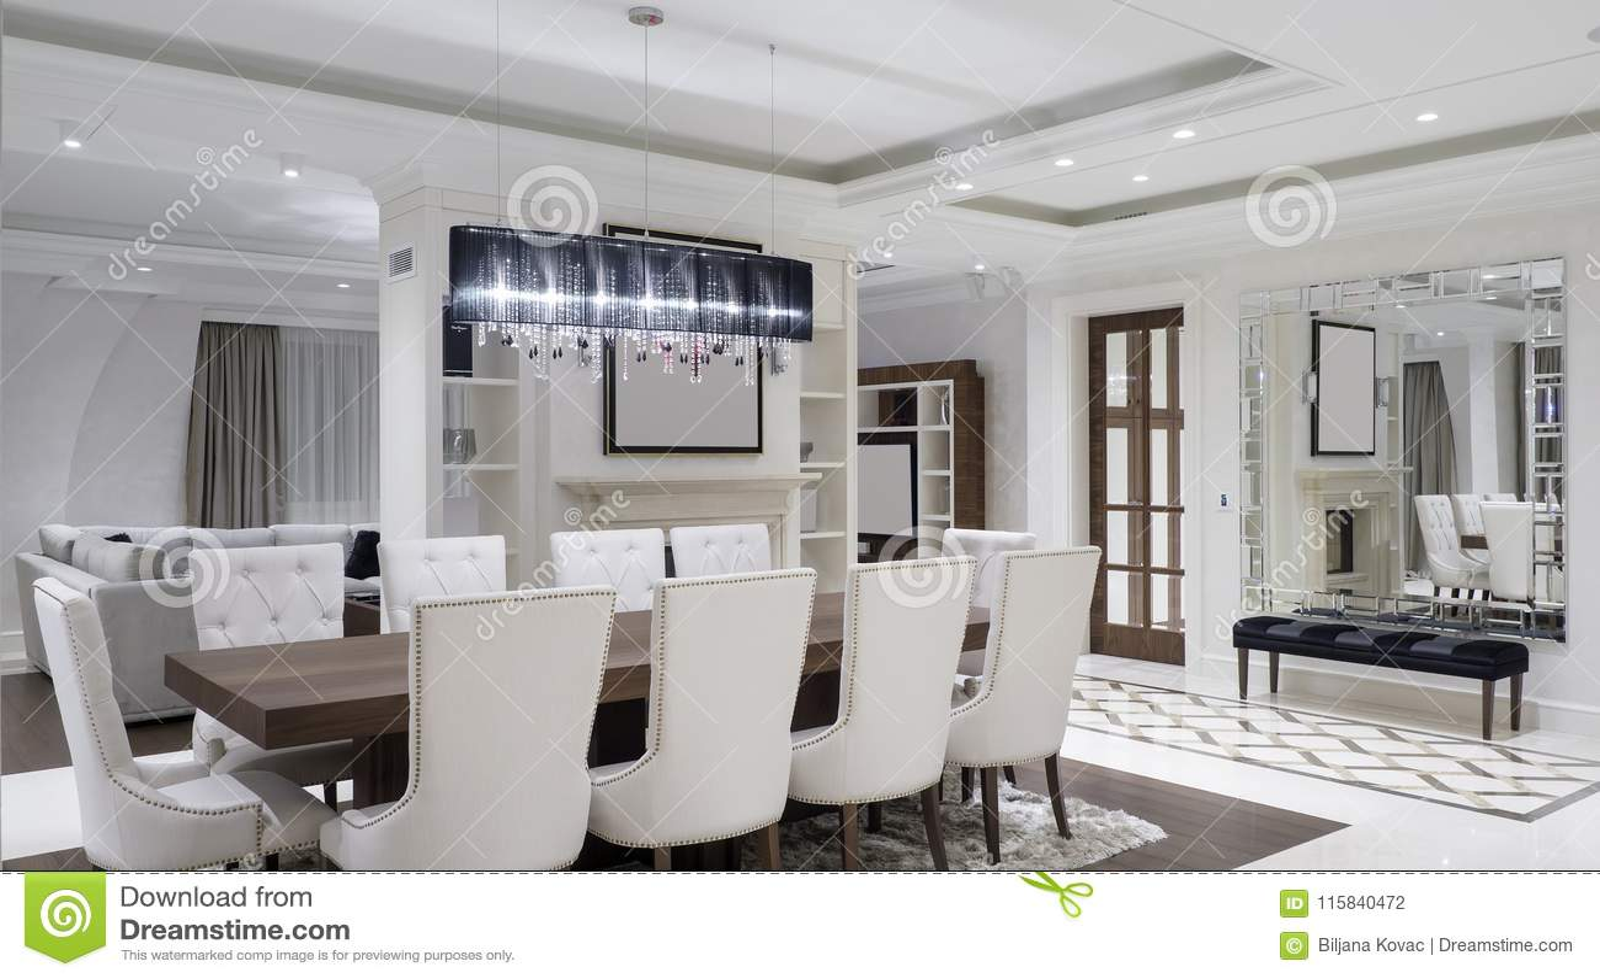 Modern Minimalist Dining Room Stock Photo   Image of leather ...